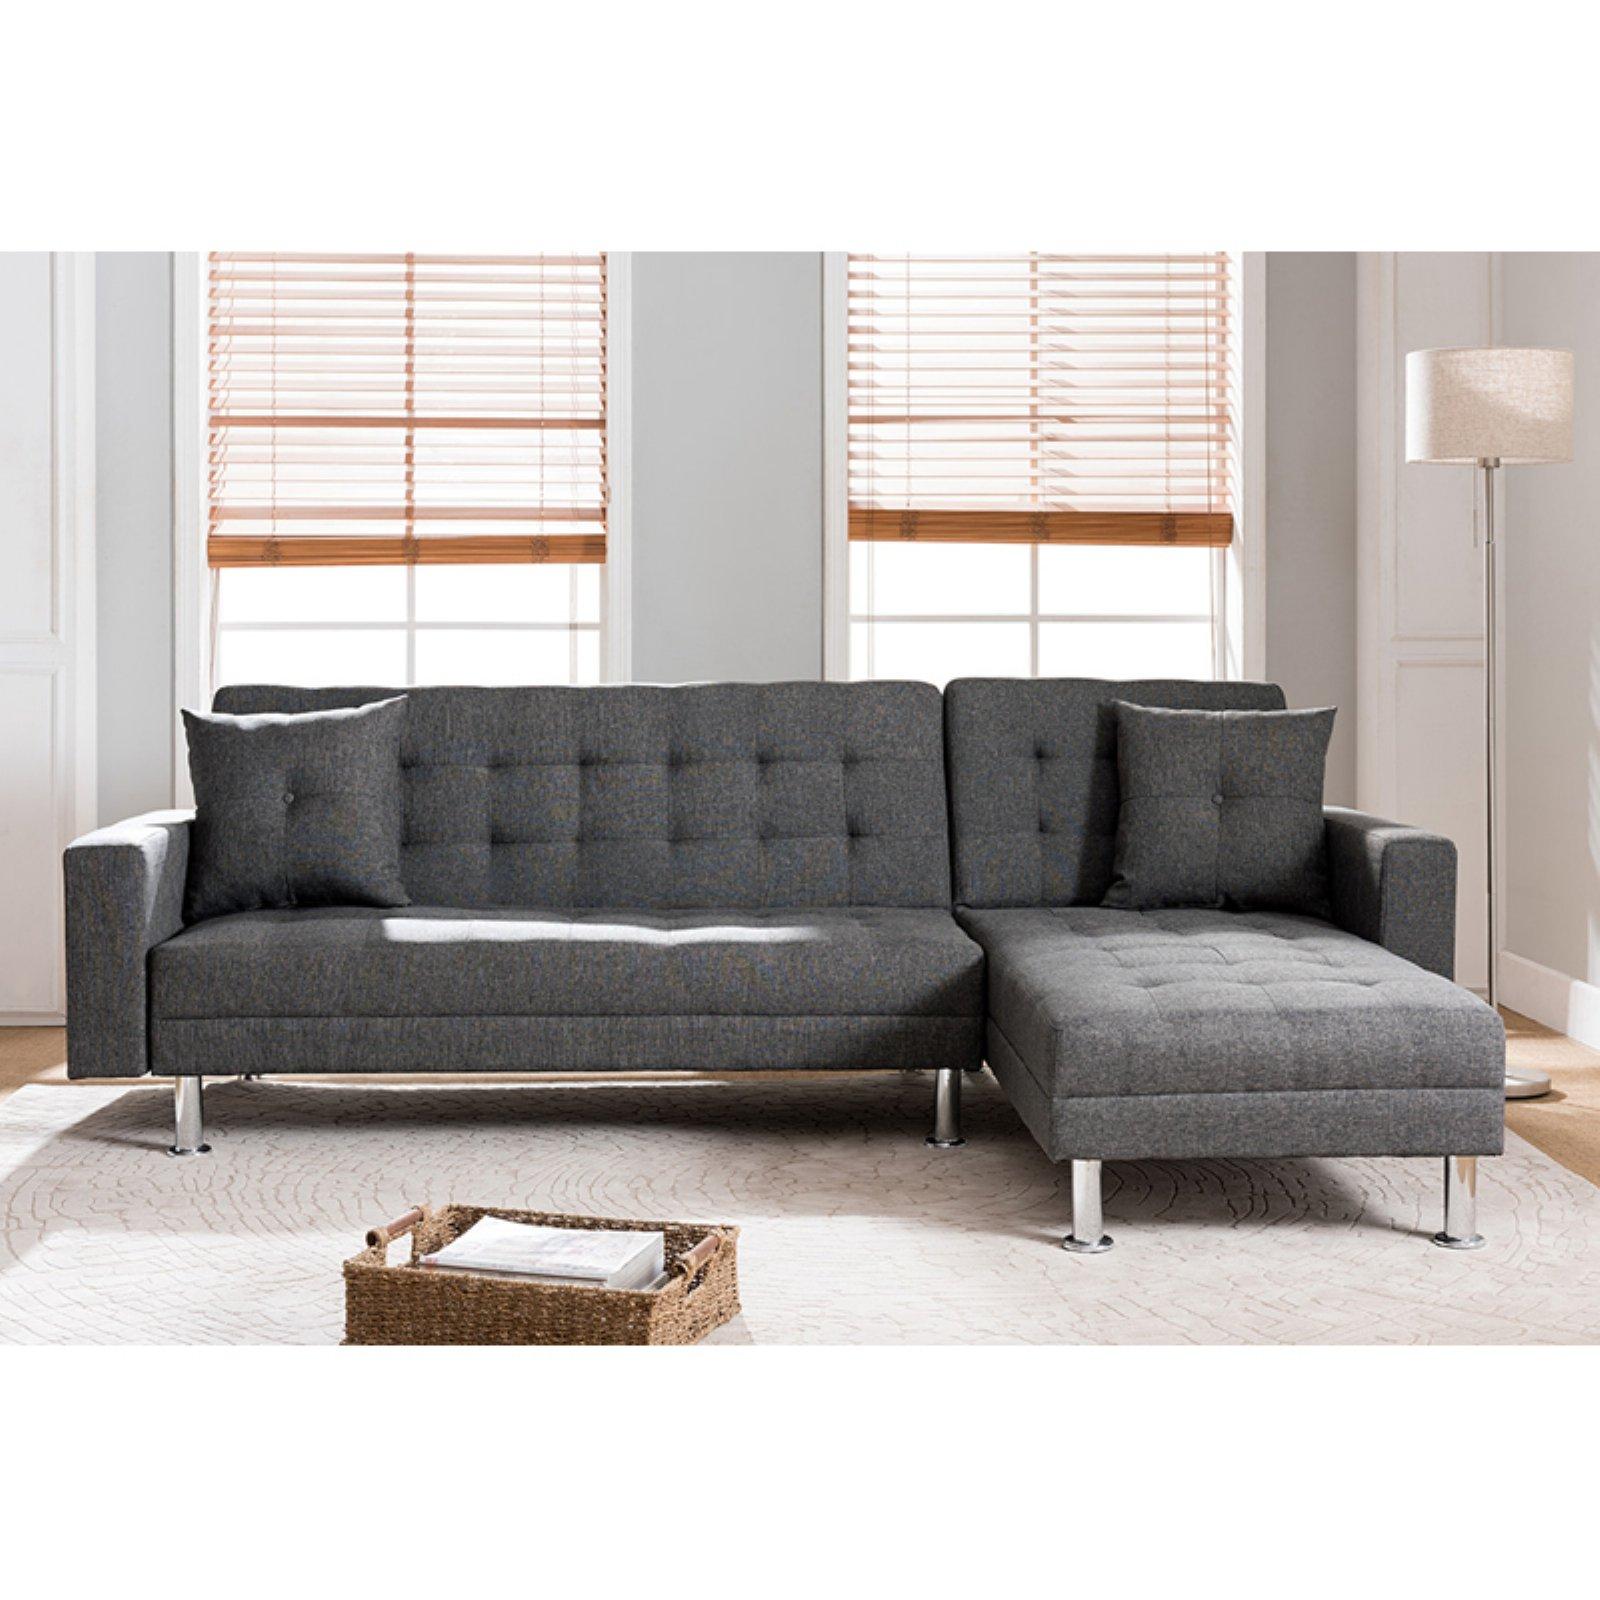 Milton Greens Stars Jett Reversible Chaise Sofa Bed Sectional